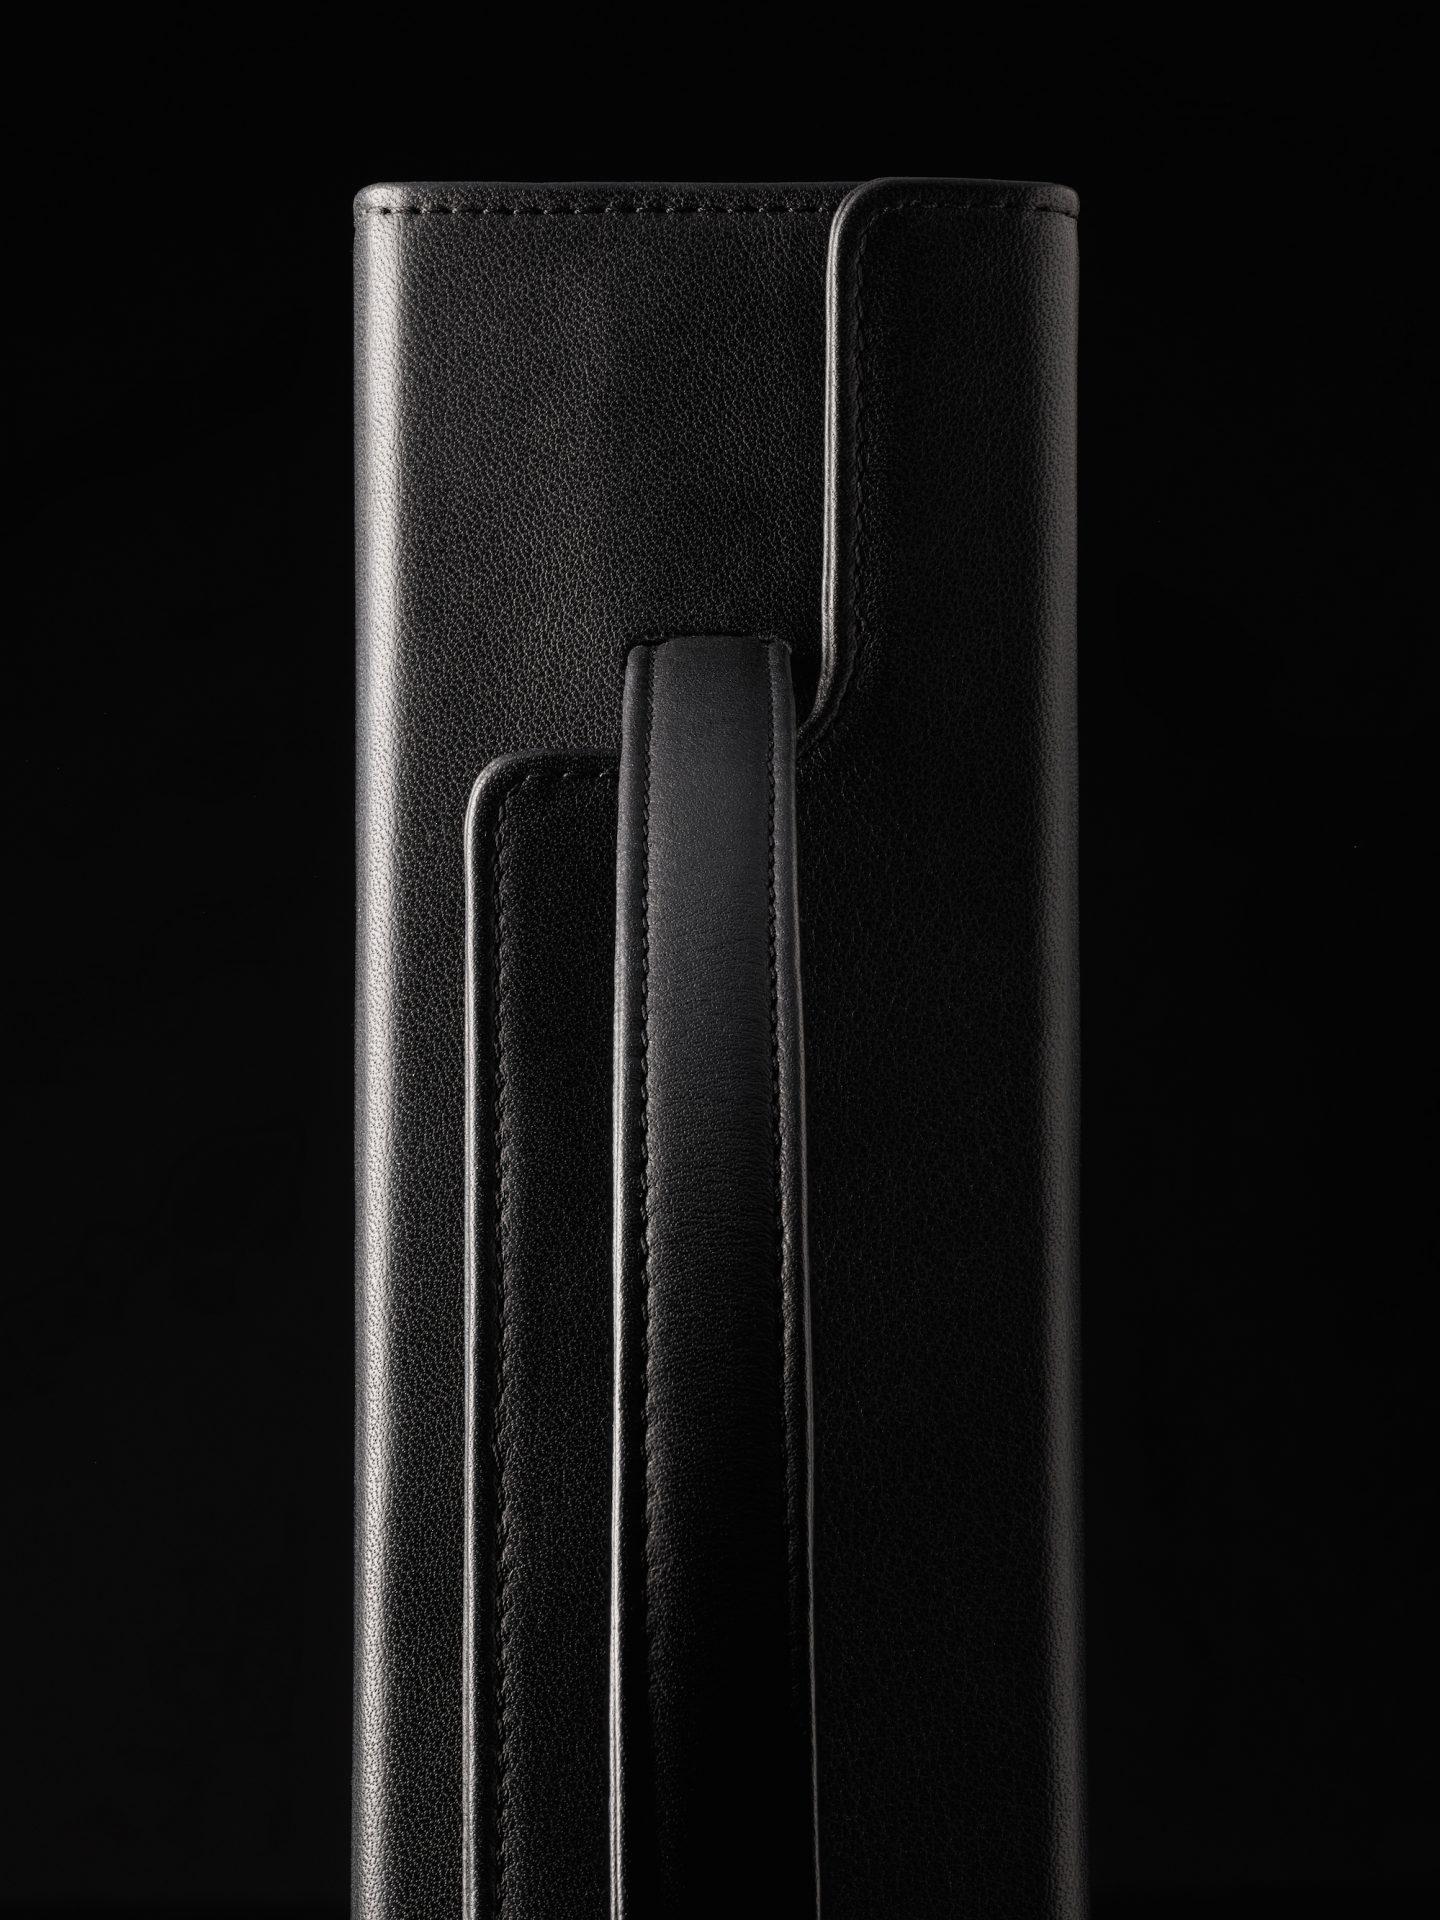 IGNANT-Design-Tsatsas-Dieter-Rams-931-006